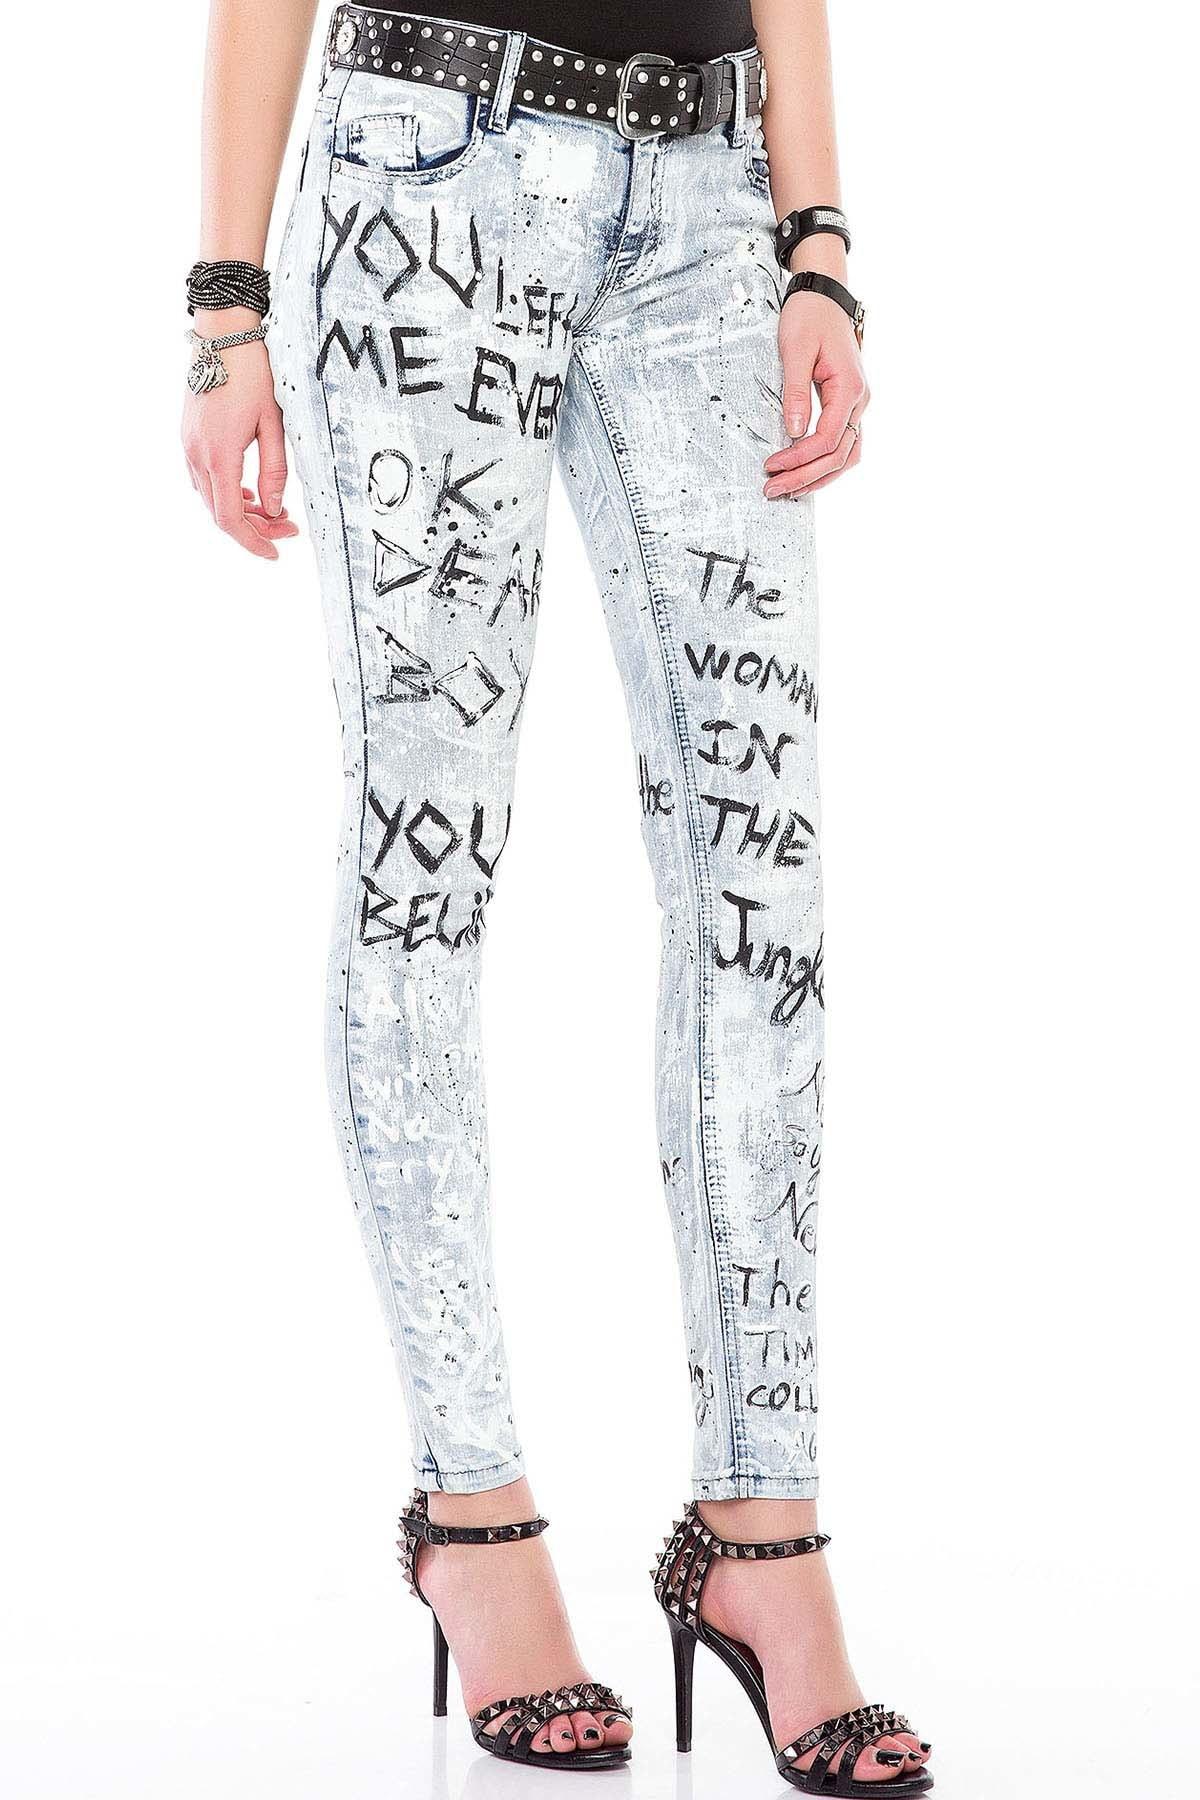 Cipo&Baxx WD370 Boyalı Baskılı Buz Mavi Slim Fit Bayan Jeans Kot 1